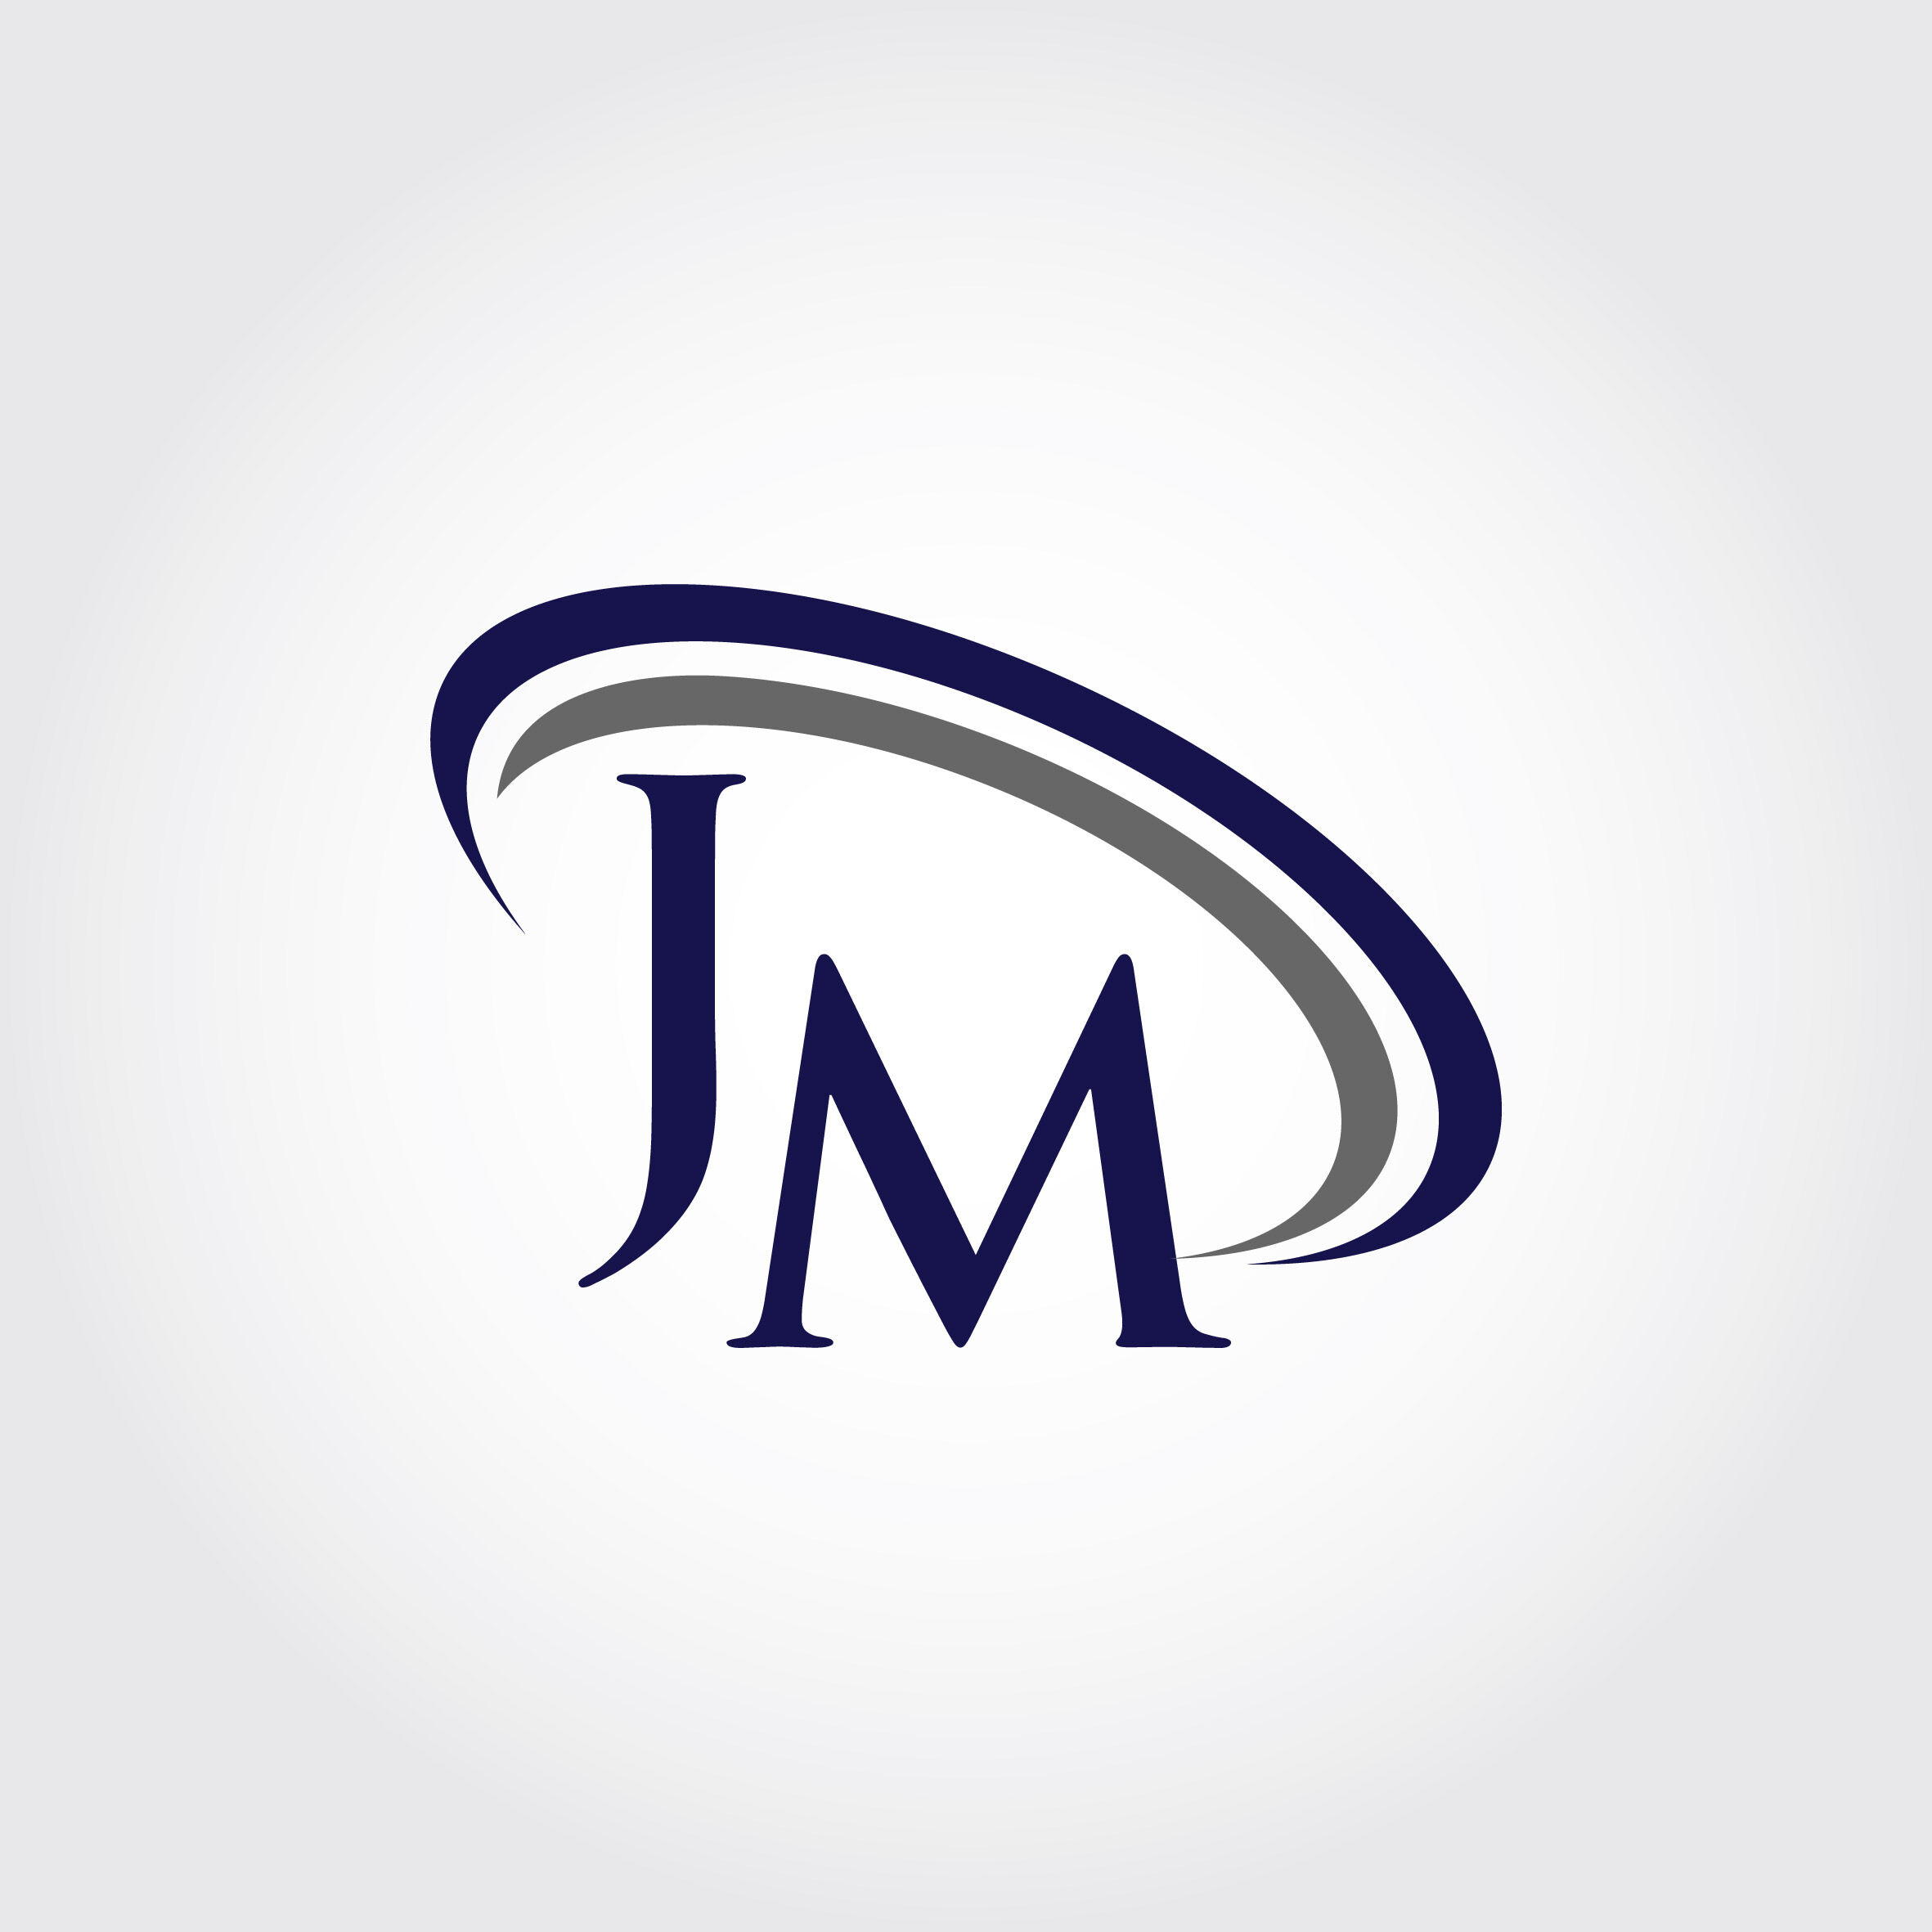 JM Golf by Deron Sizemore on Dribbble